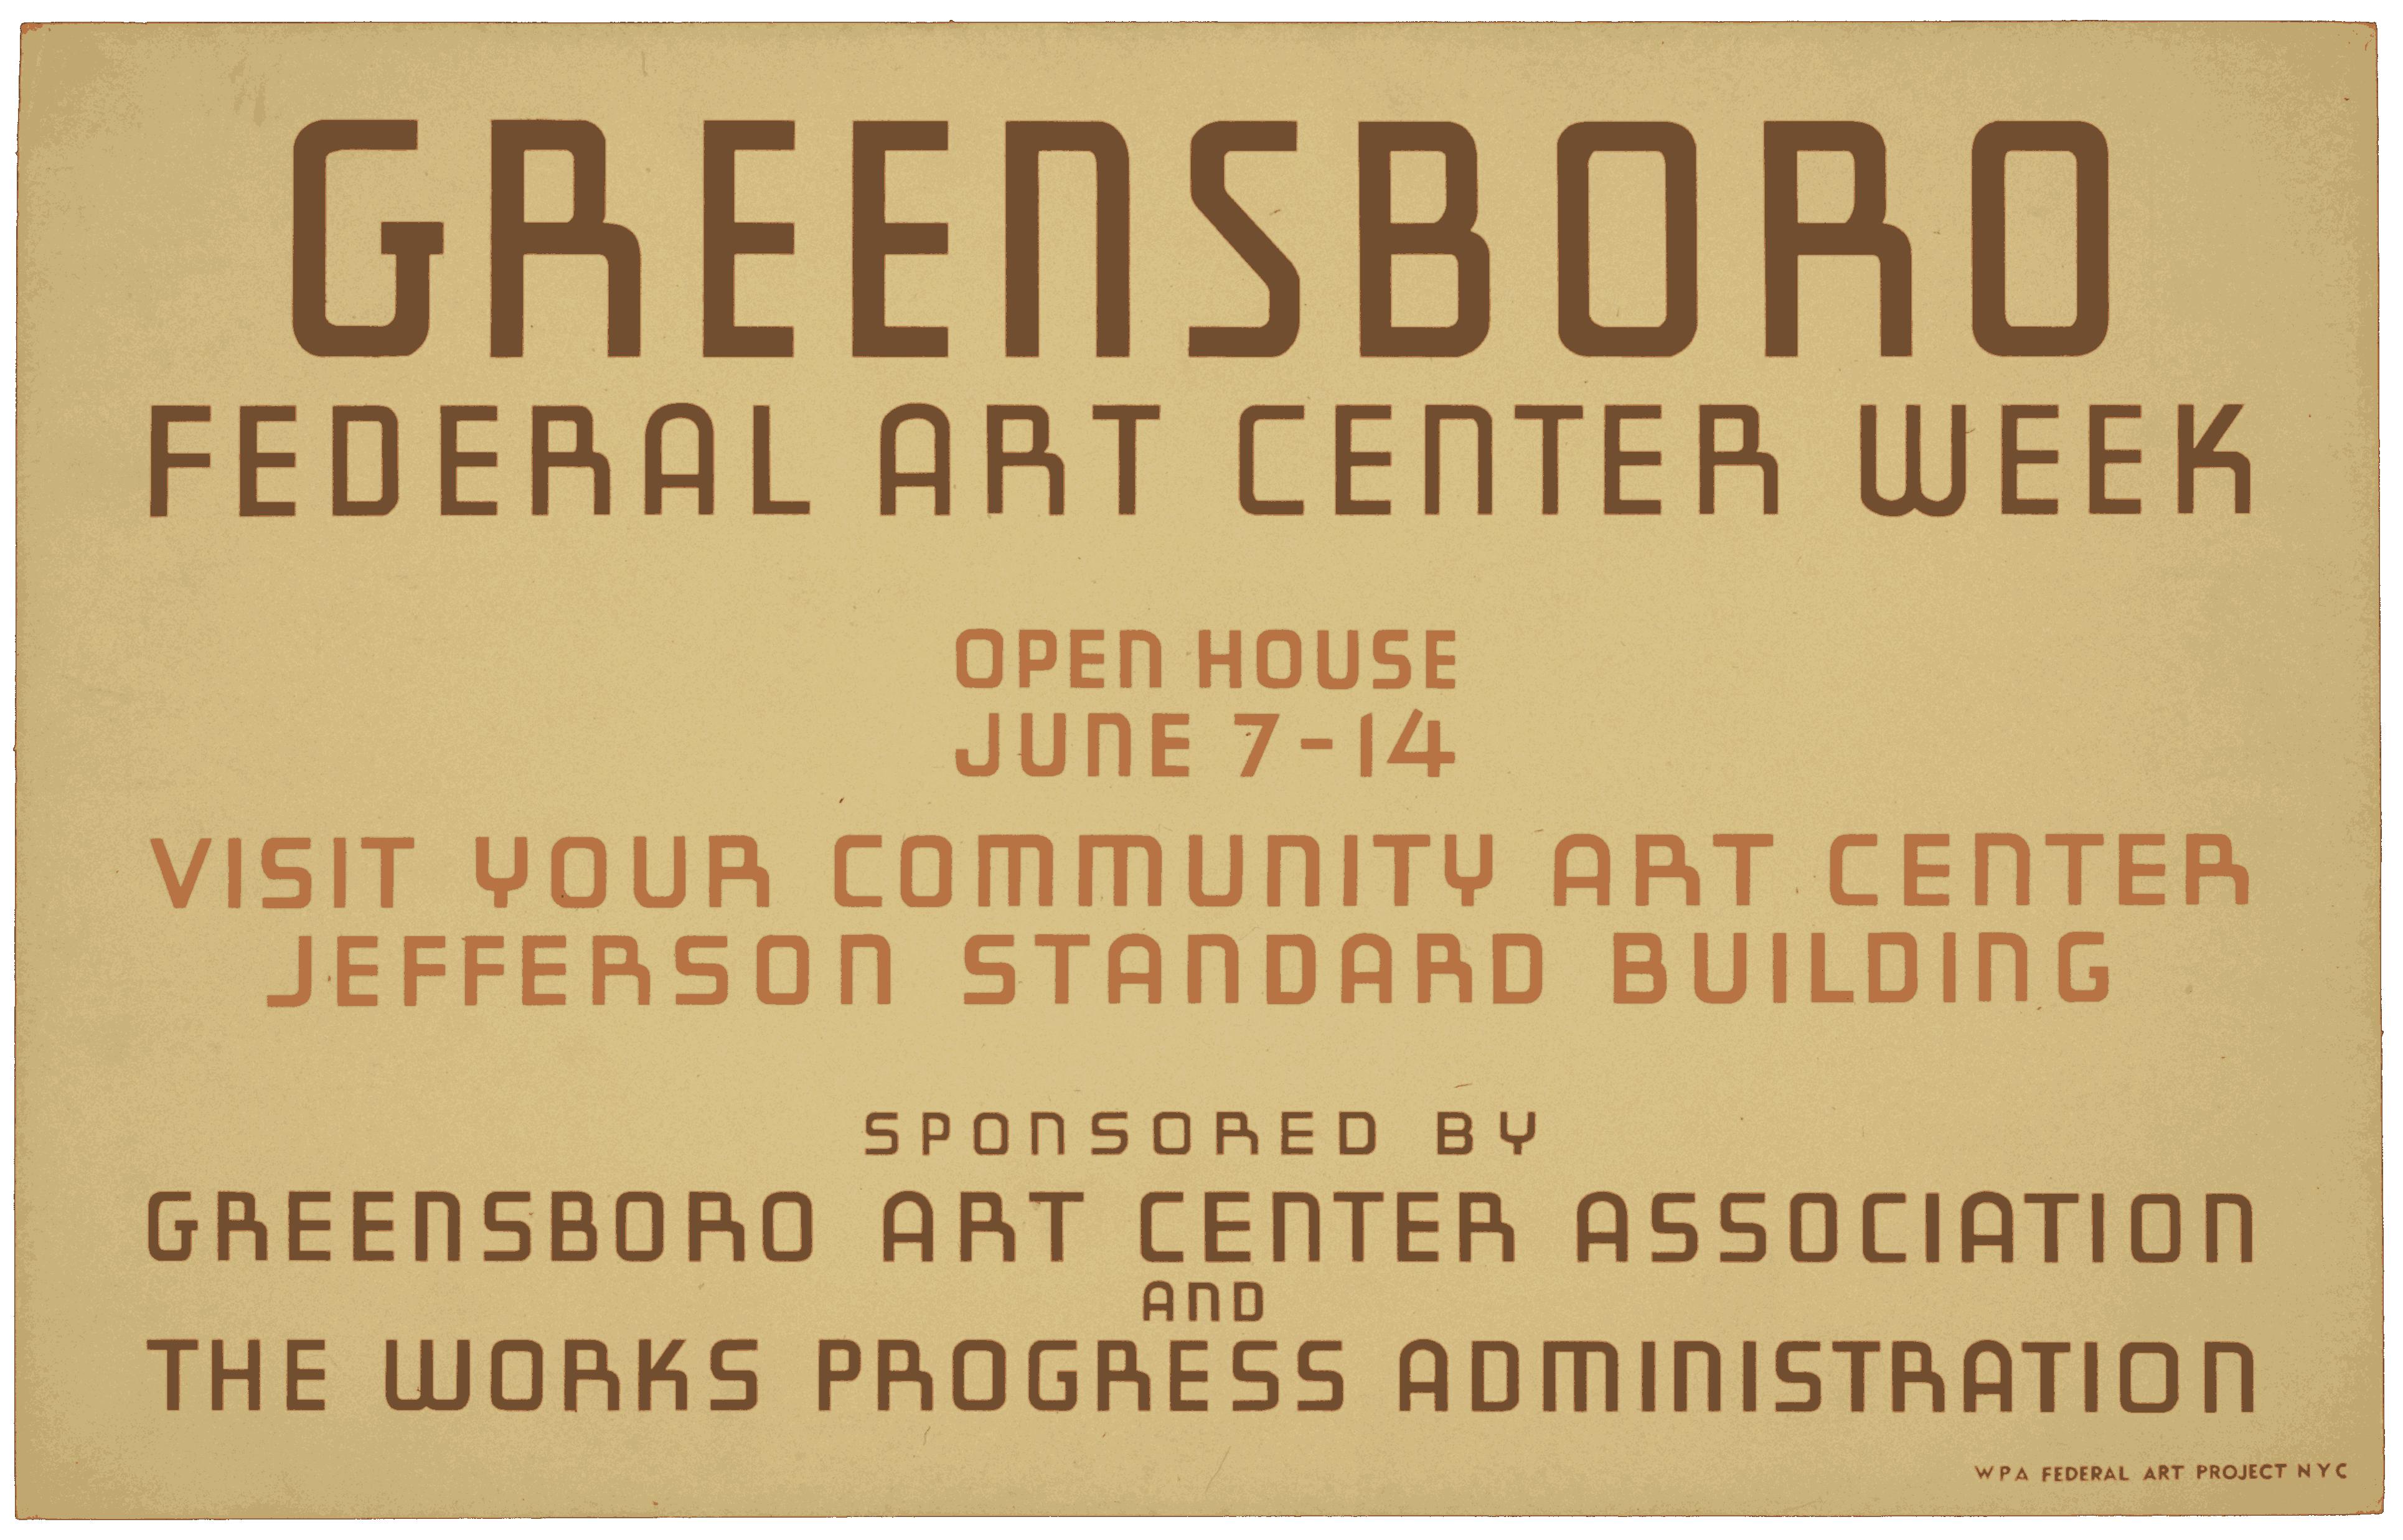 Greensboro Federal Art Center week Open house June 7-14 : Visit your community art center, Jefferso…